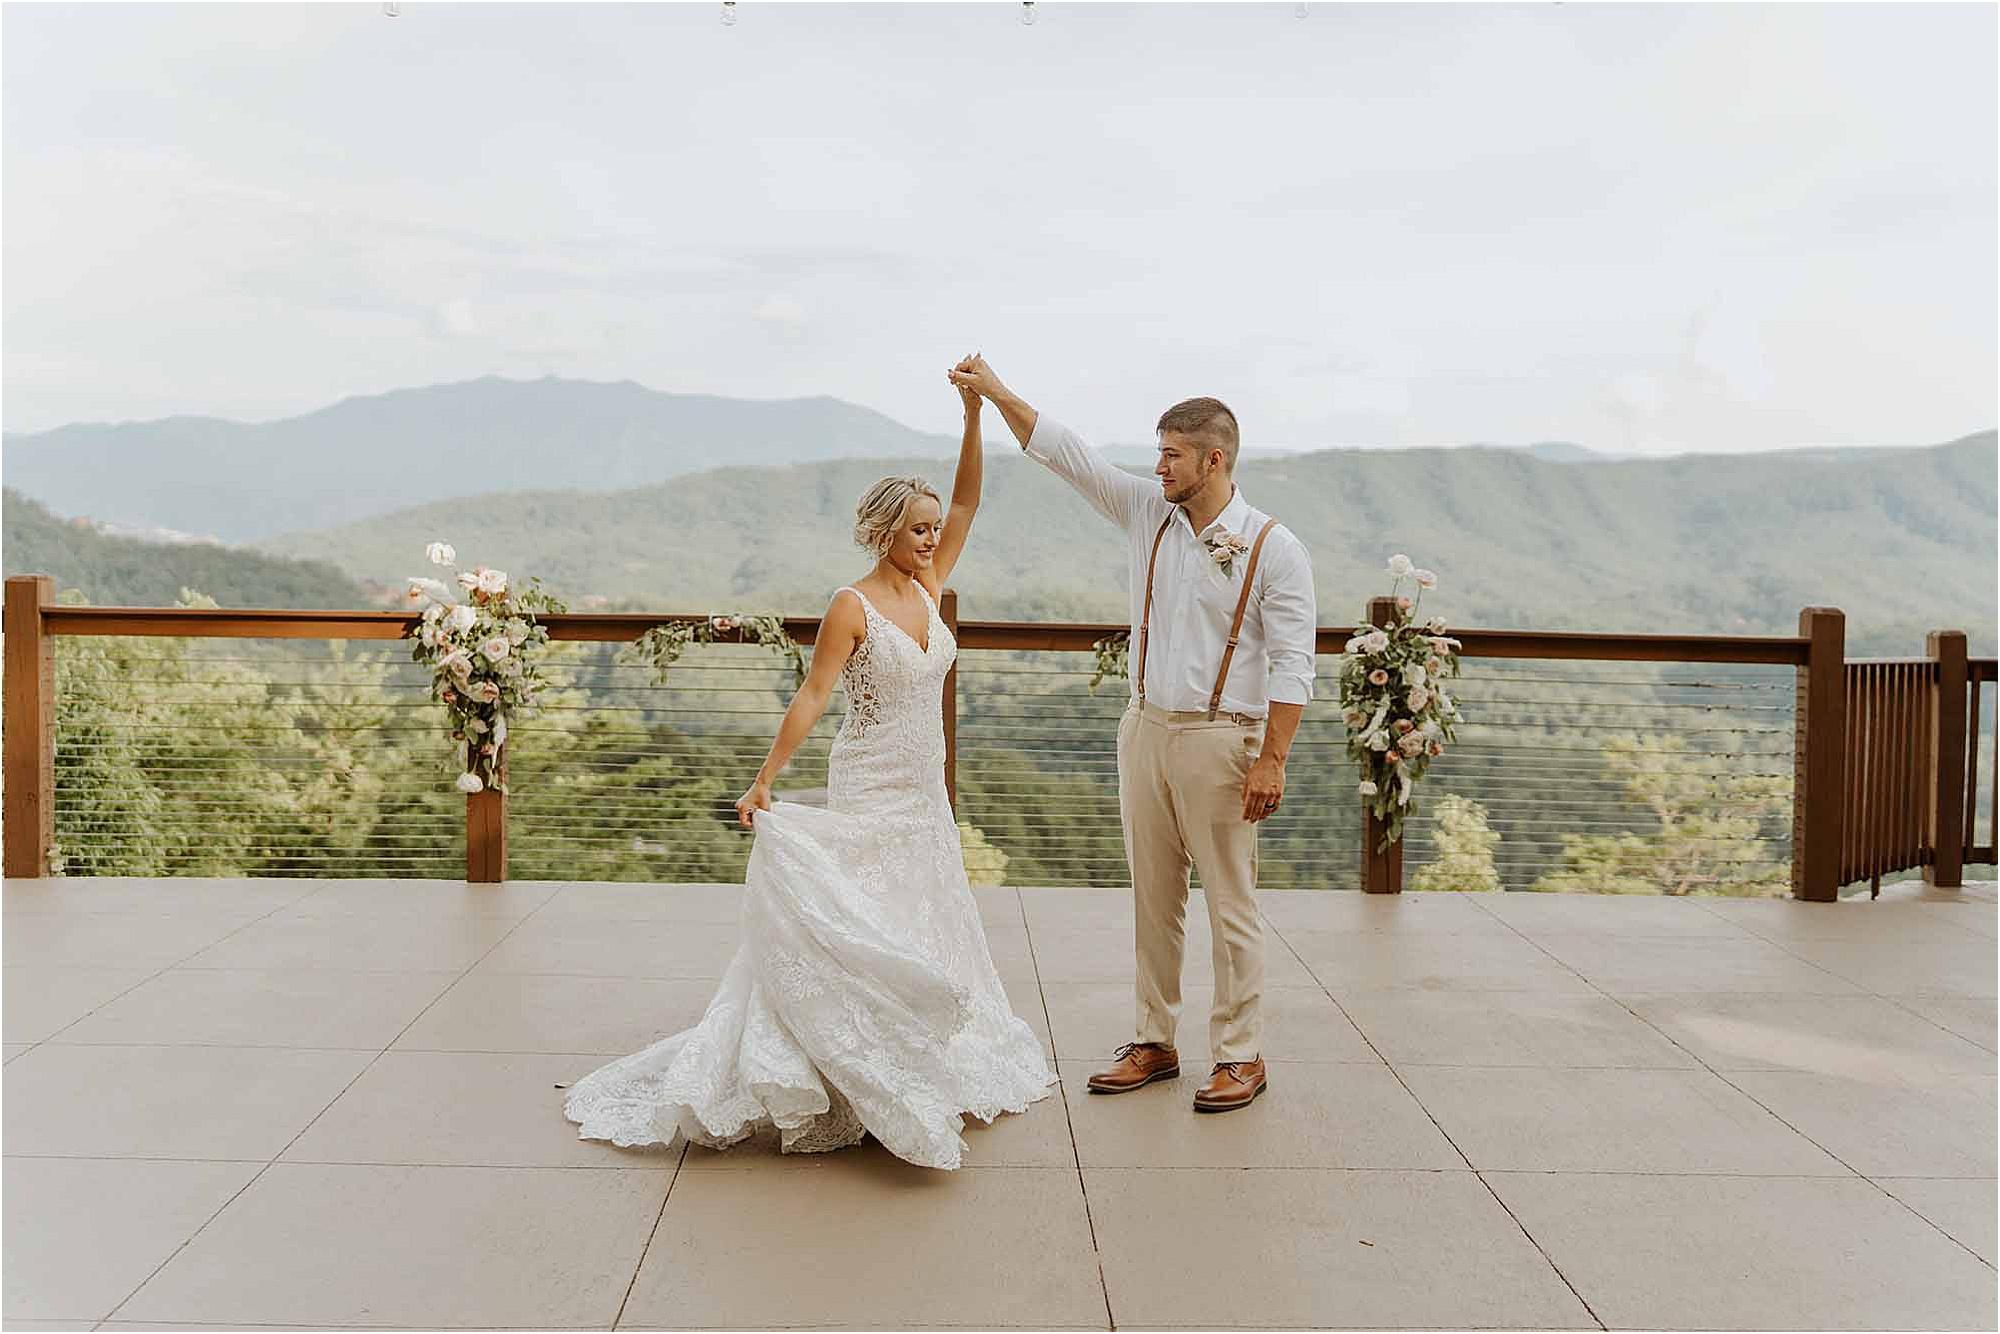 groom twirling bride on patio